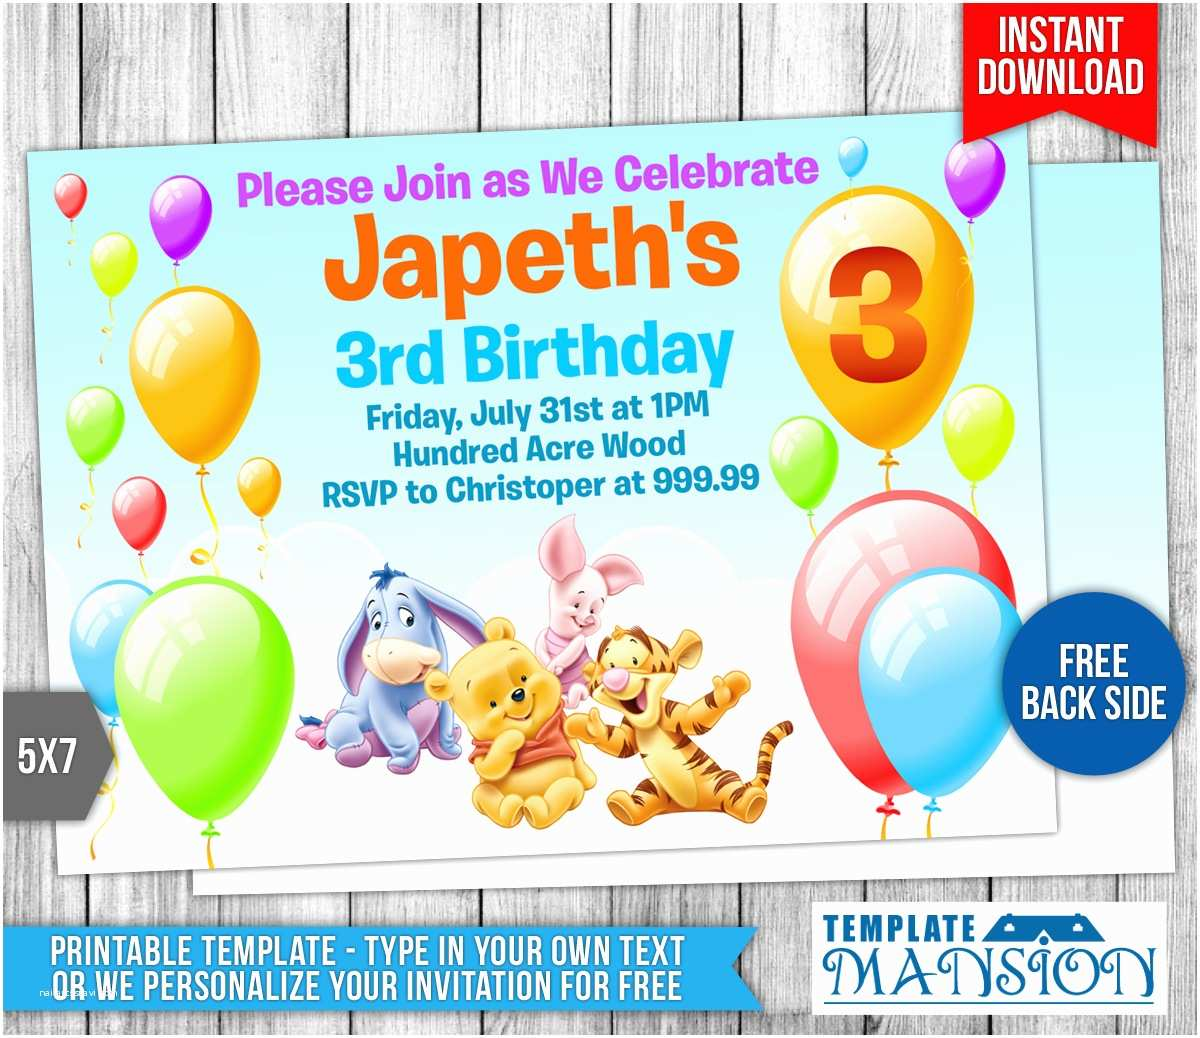 Winnie the Pooh Party Invites Winnie the Pooh Birthday Invitation by Templatemansion On